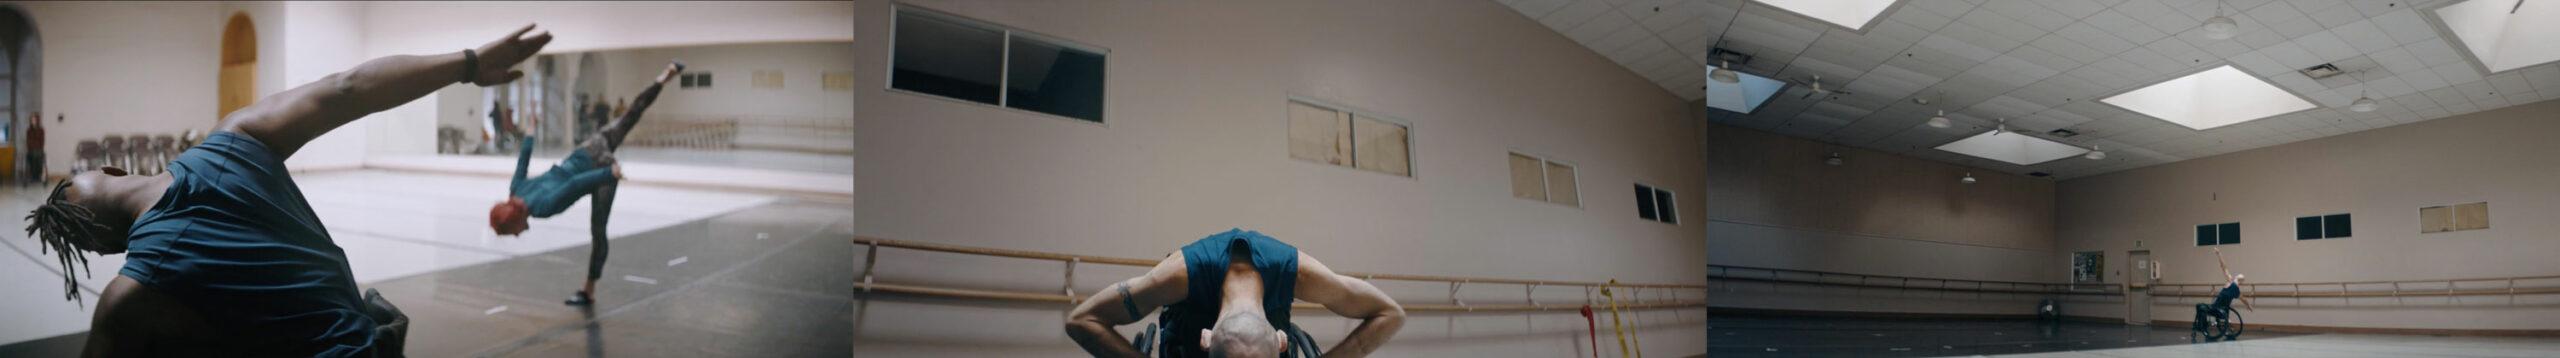 Target-Axis-Dance-Company-Igor-Kropotov-Director-of-Photography